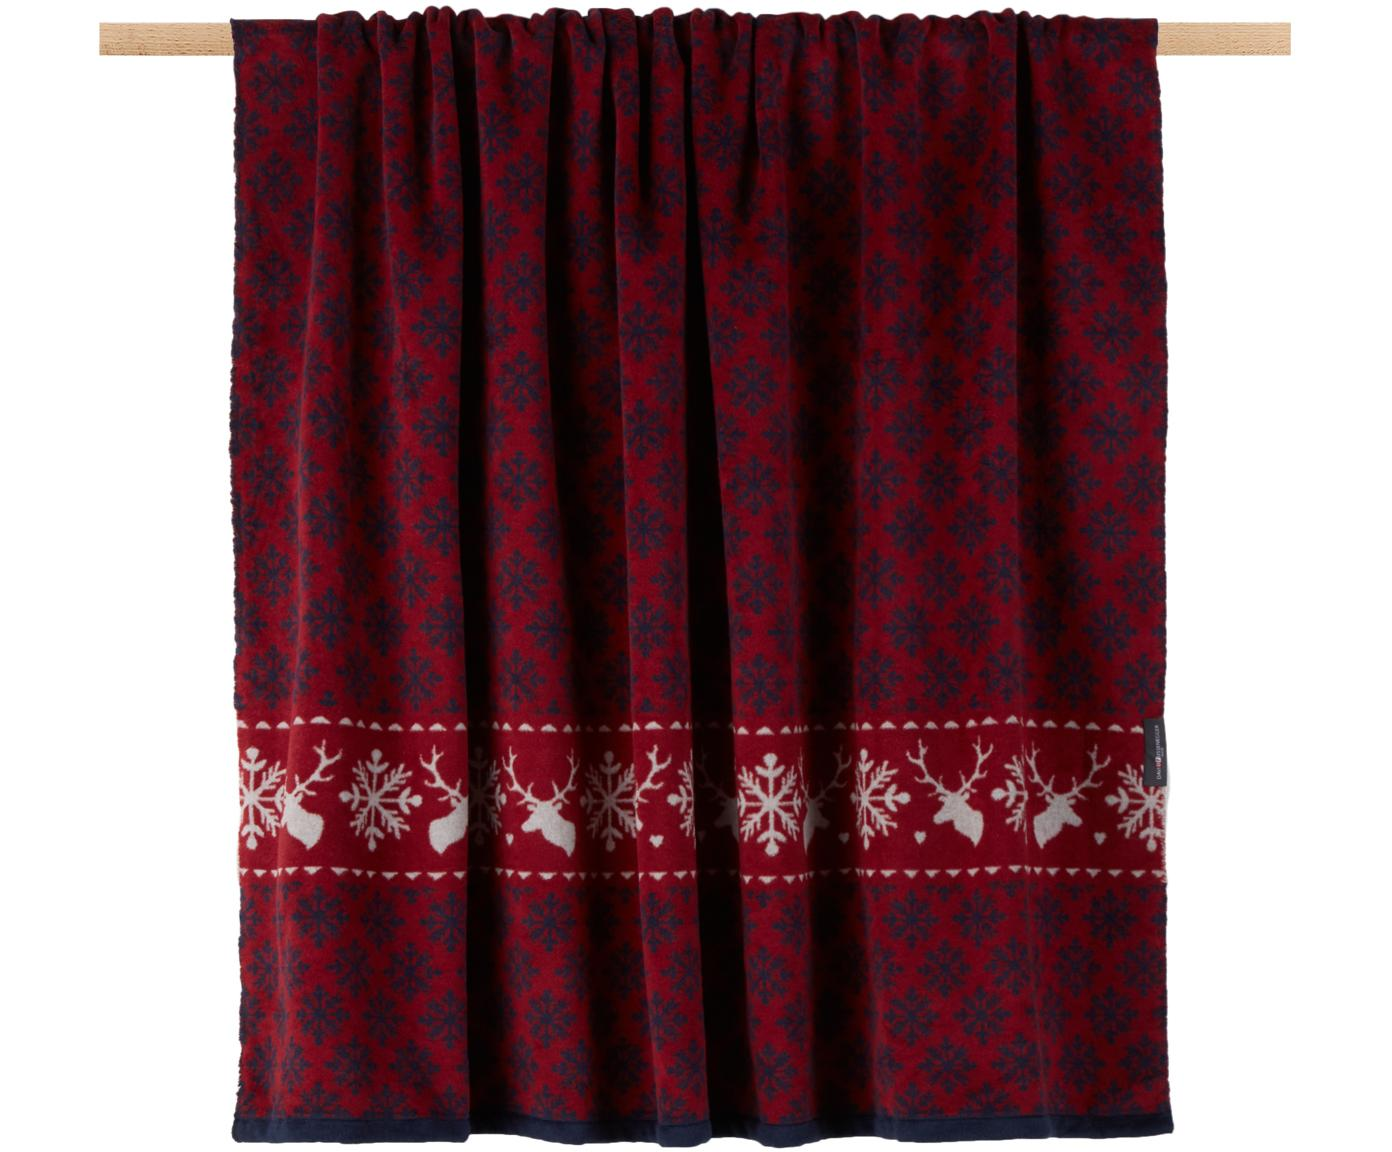 Manta doble cara de tela polar Montana Snow, 85%algodón, 8%viscosa, 7%poliacrílico, Rojo, azul, An 150 x L 200 cm